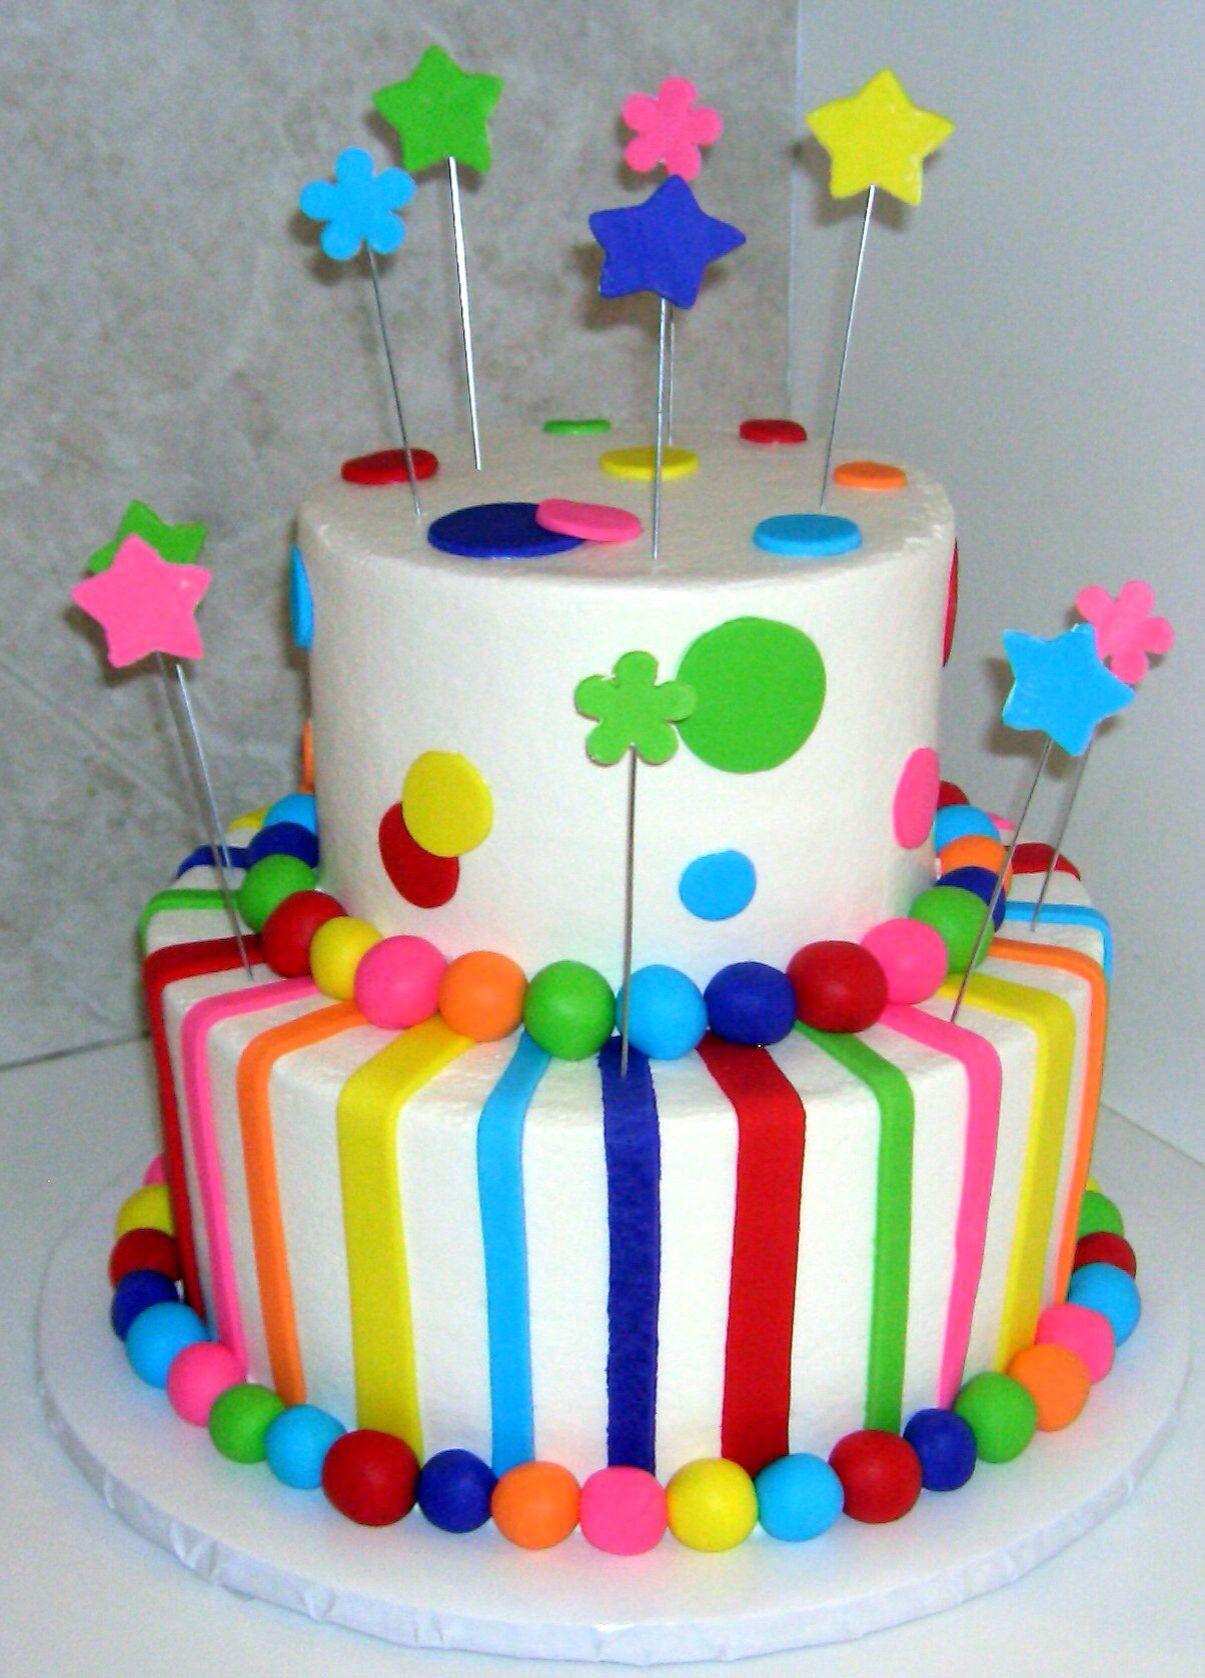 Multi color cake | Cakes Colors & Themes | Pinterest | Torten ...